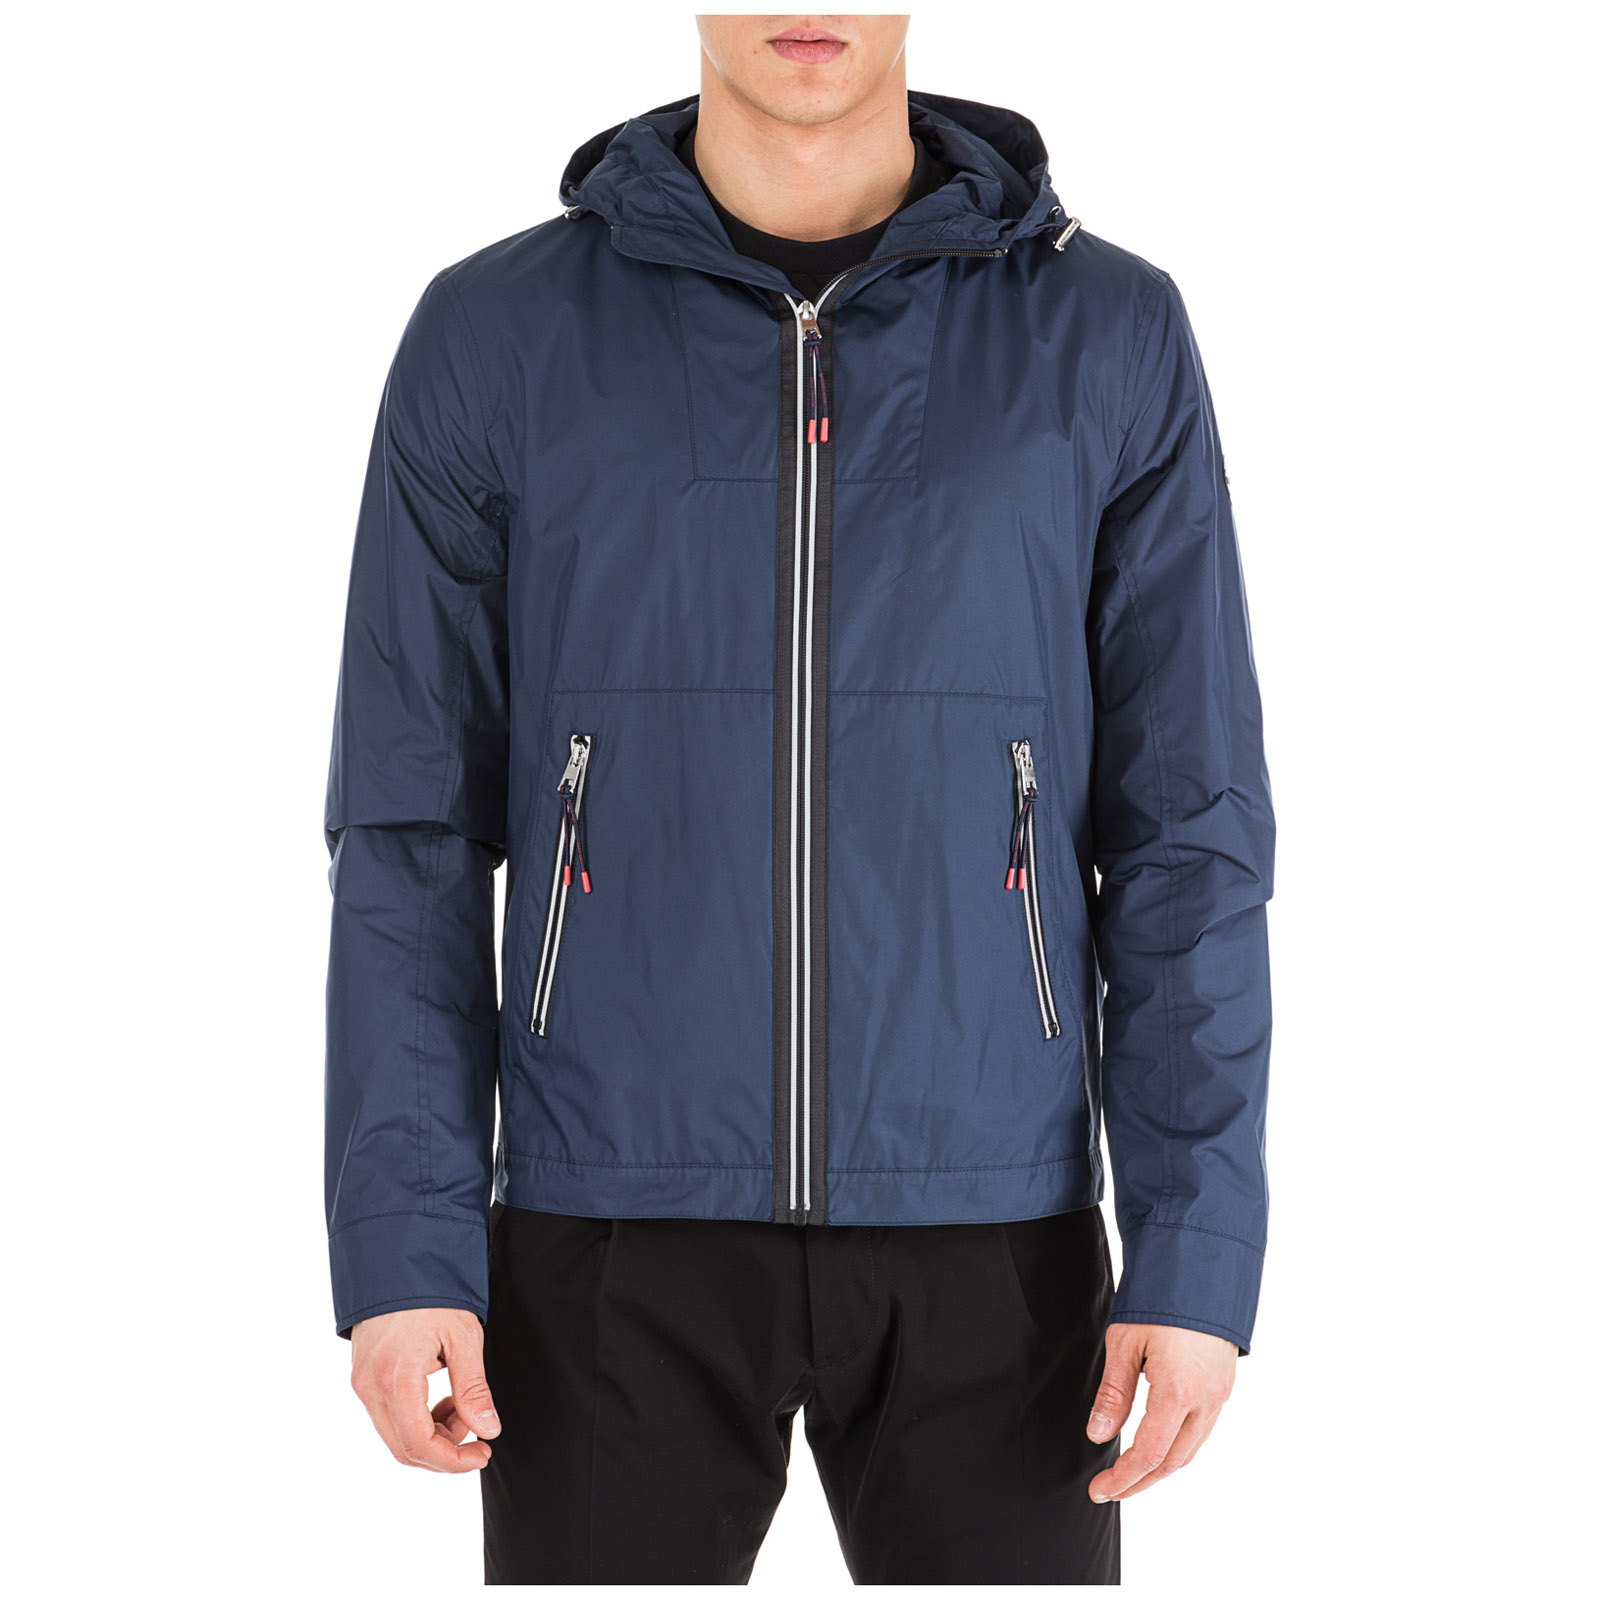 comprar online 47739 6e07c Cazadoras chaqueta de hombre